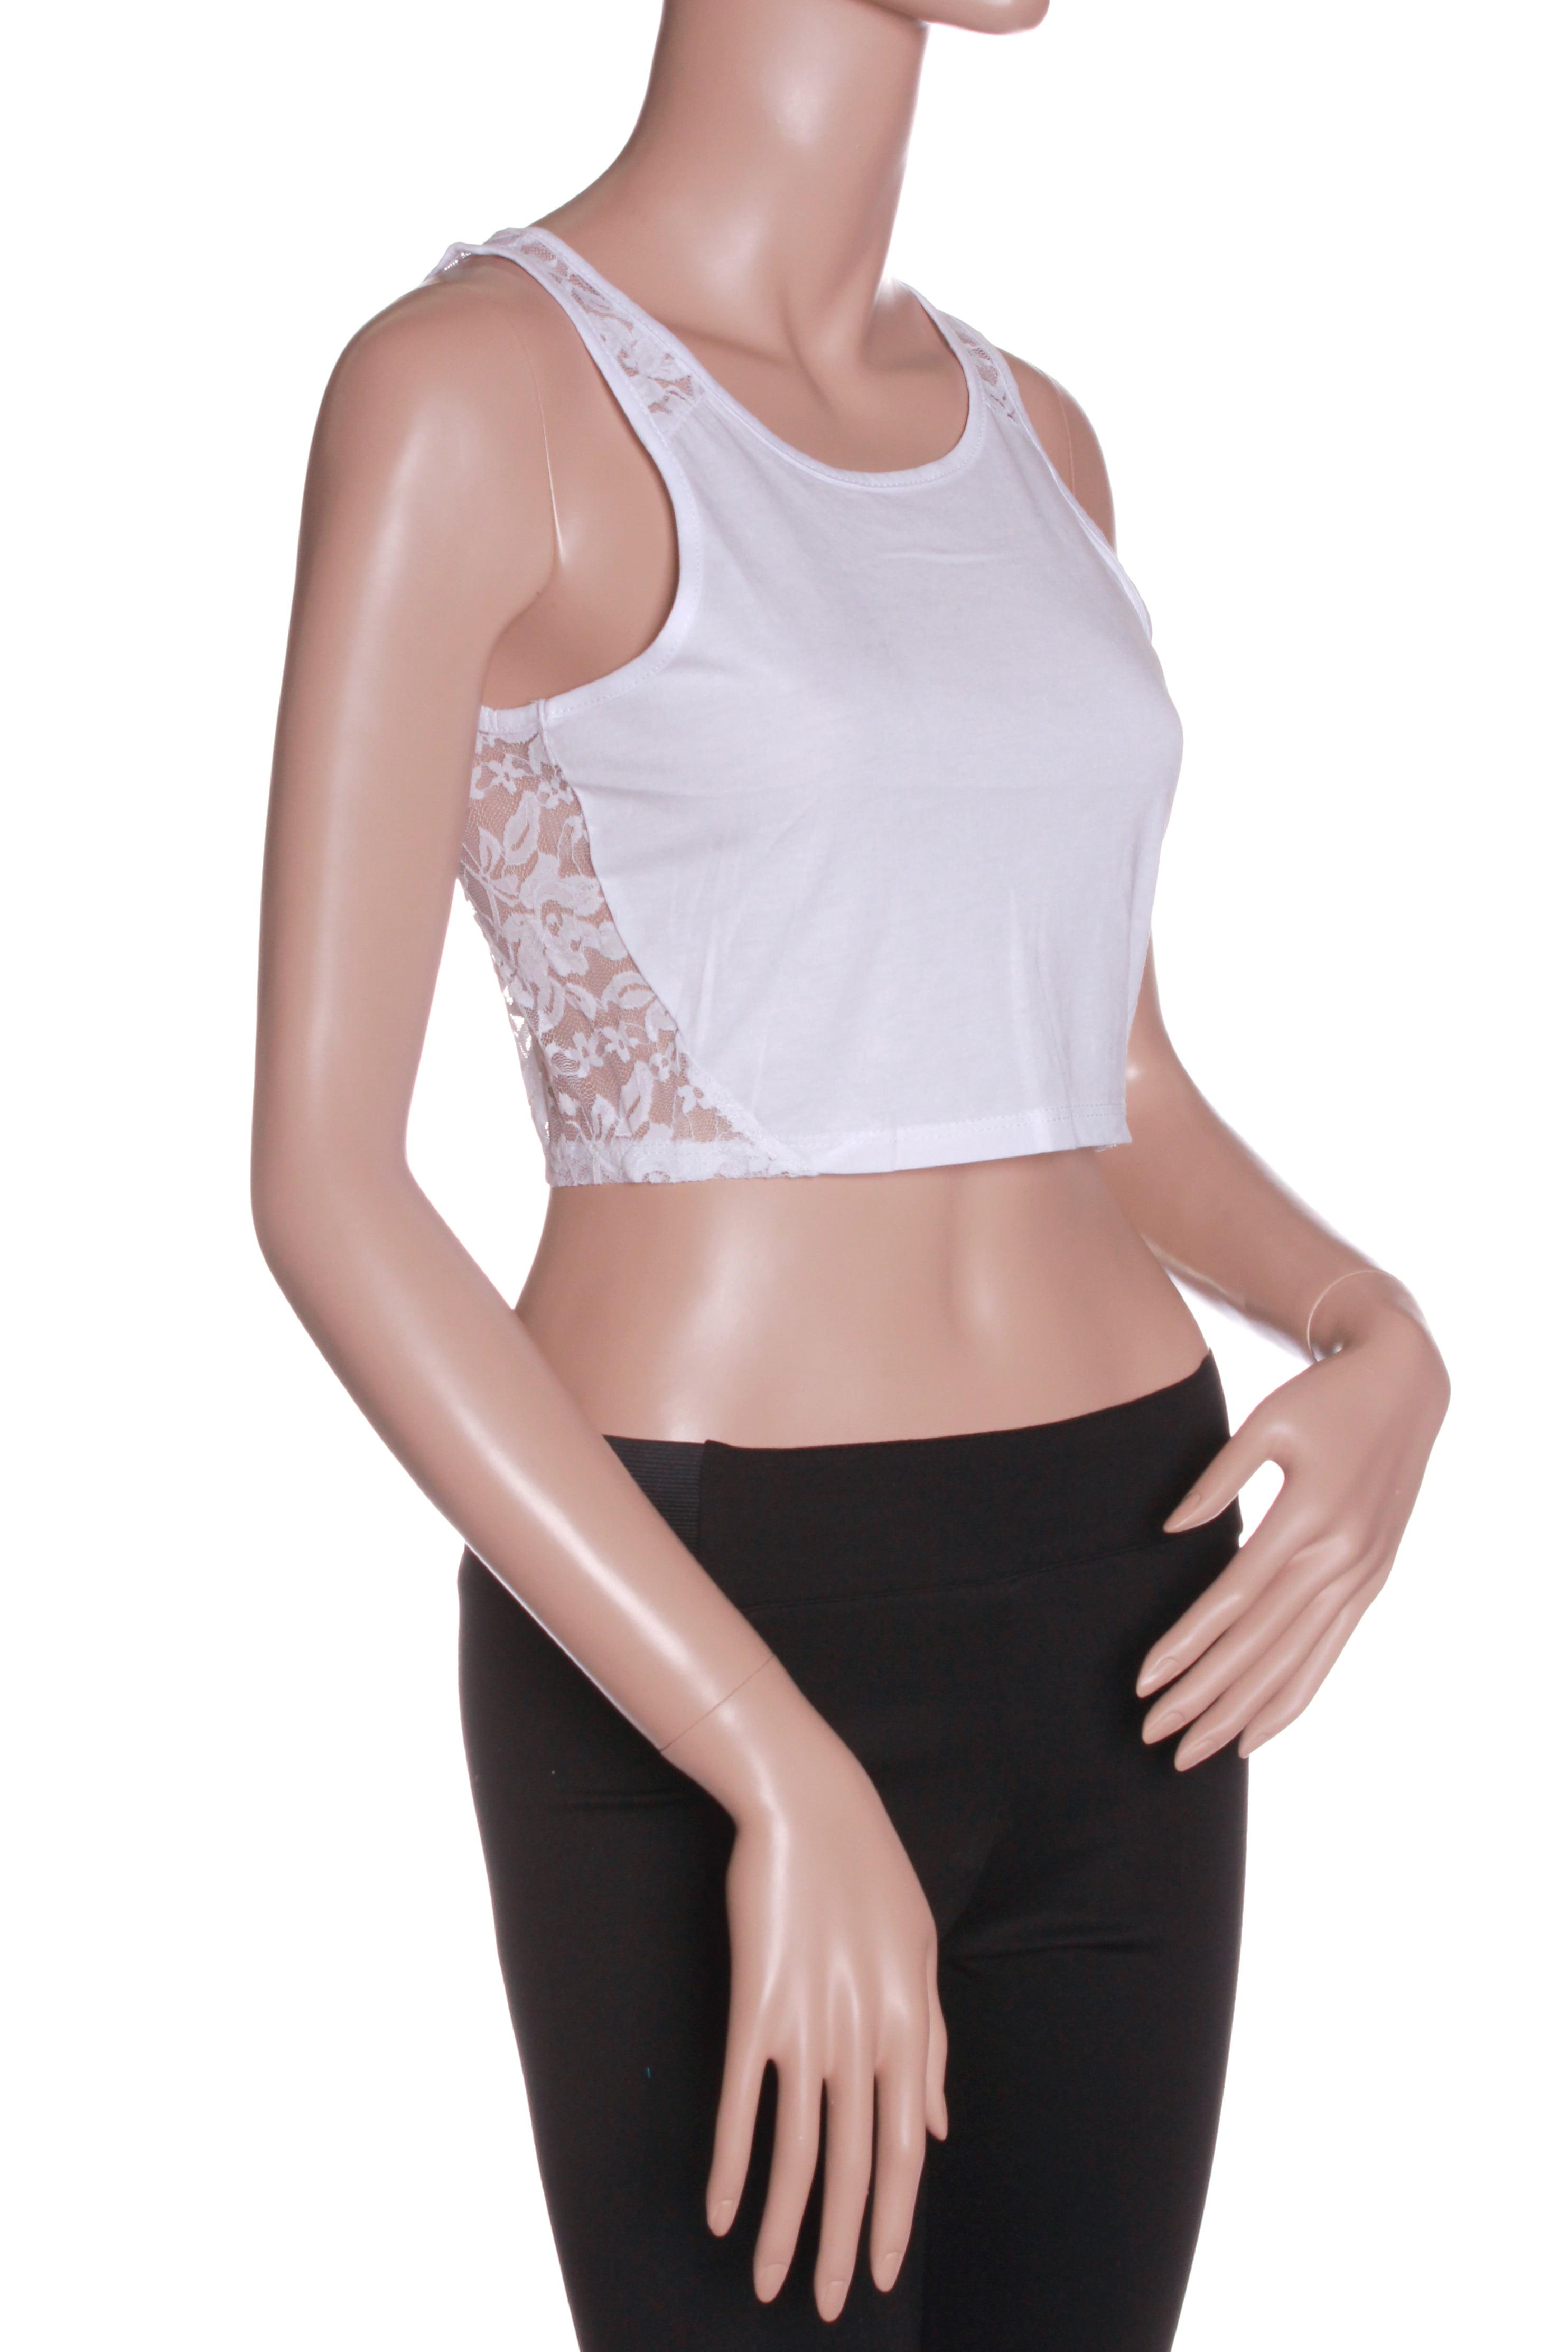 Emmalise Clothing Junior Women's Sexy Lace Crop Tank Top Short Sleeves Shirt Blouse -